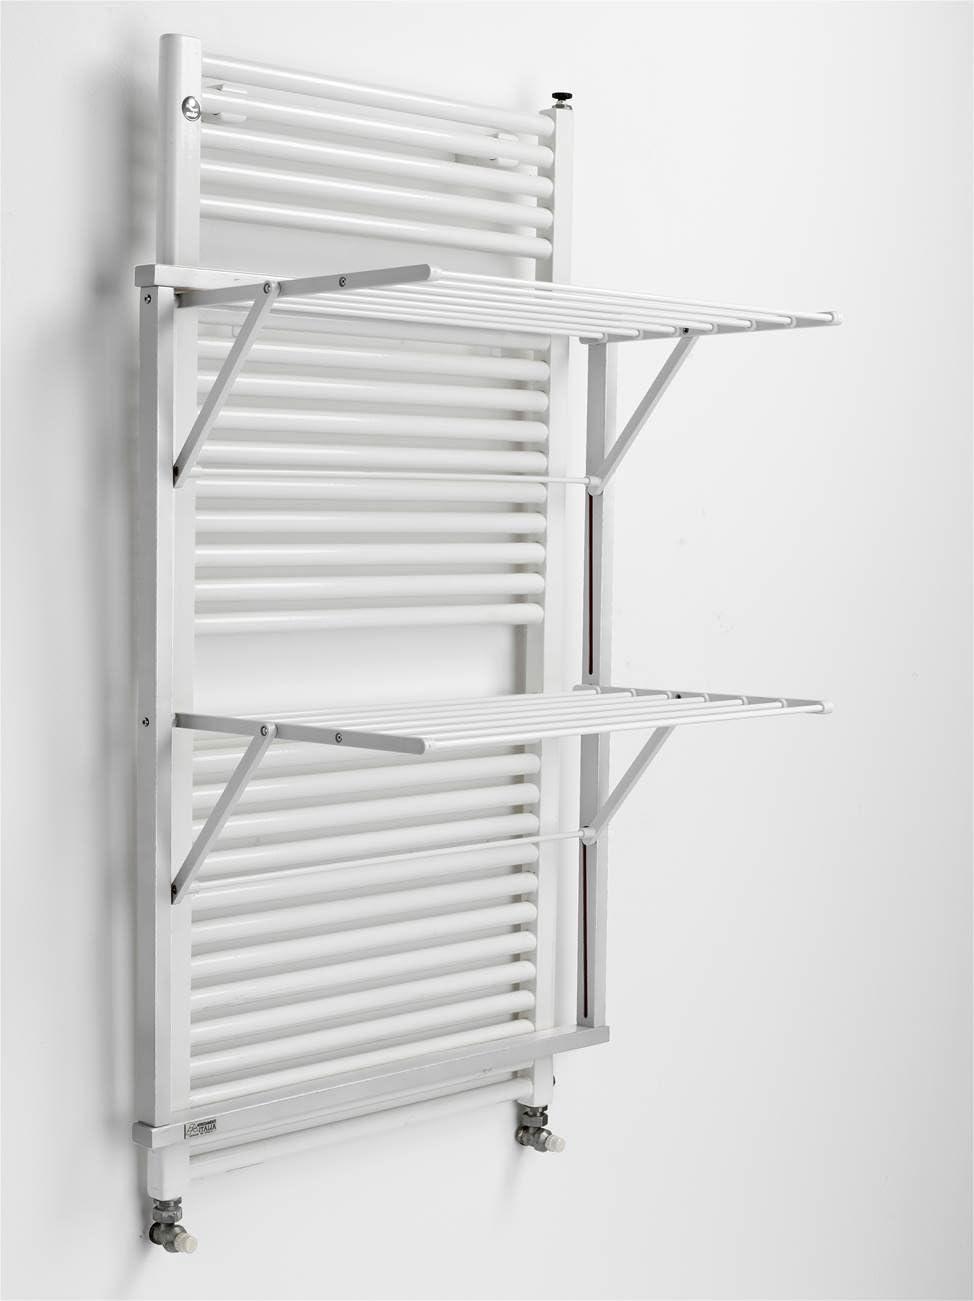 10 m extensibles Arredamenti Italia Tendedero para radiador KLAUS Plegable Color blanco Ar-It il cuore del legno madera